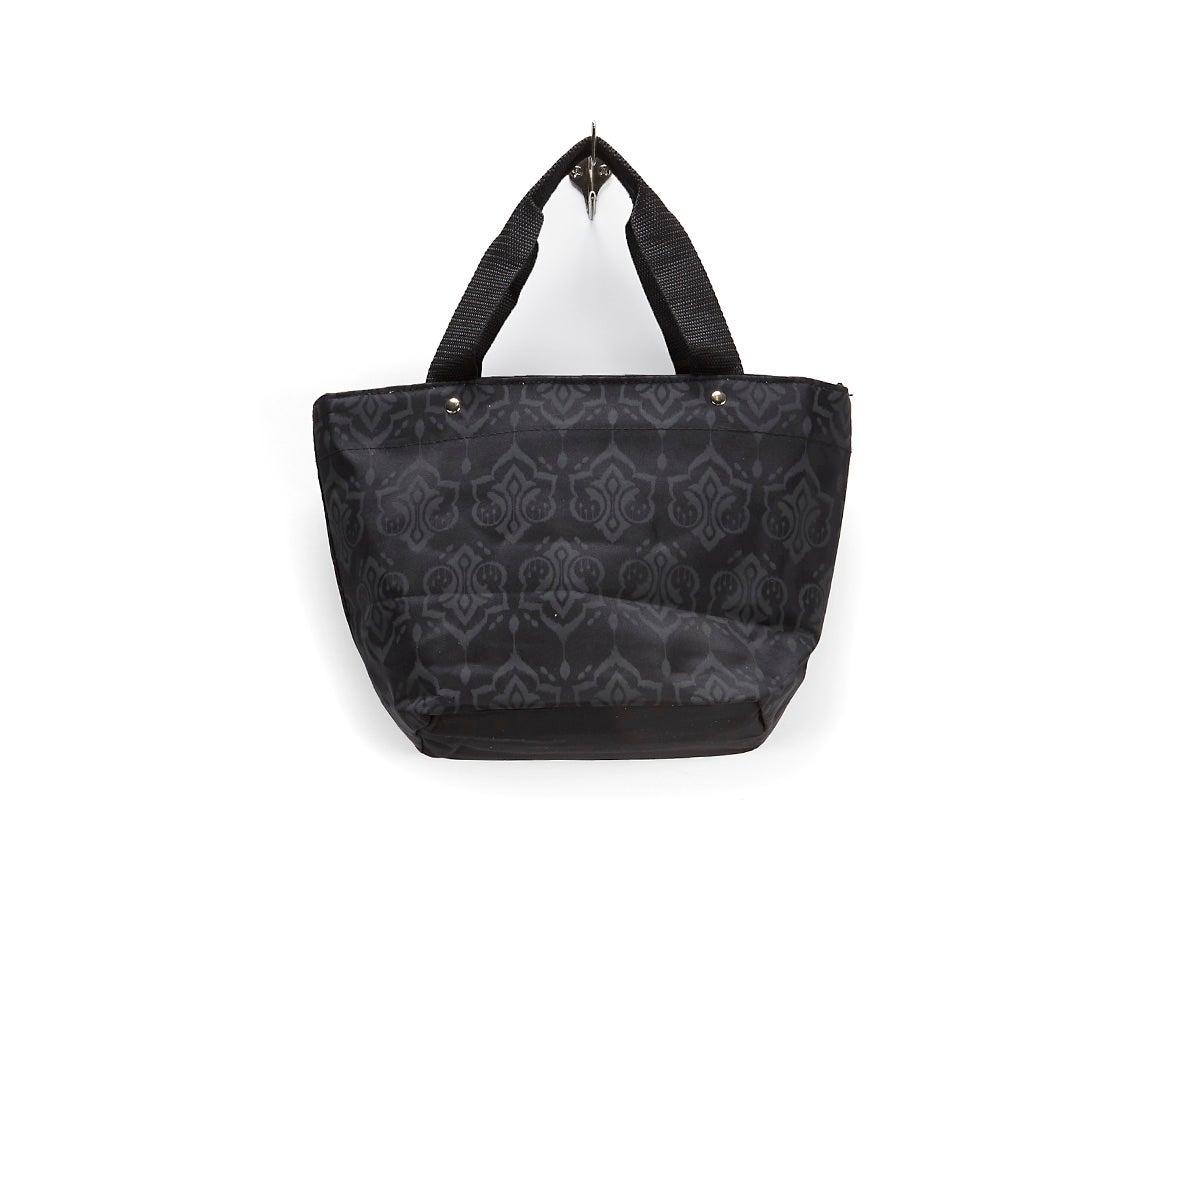 Lds blk/indigo demask printed cooler bag